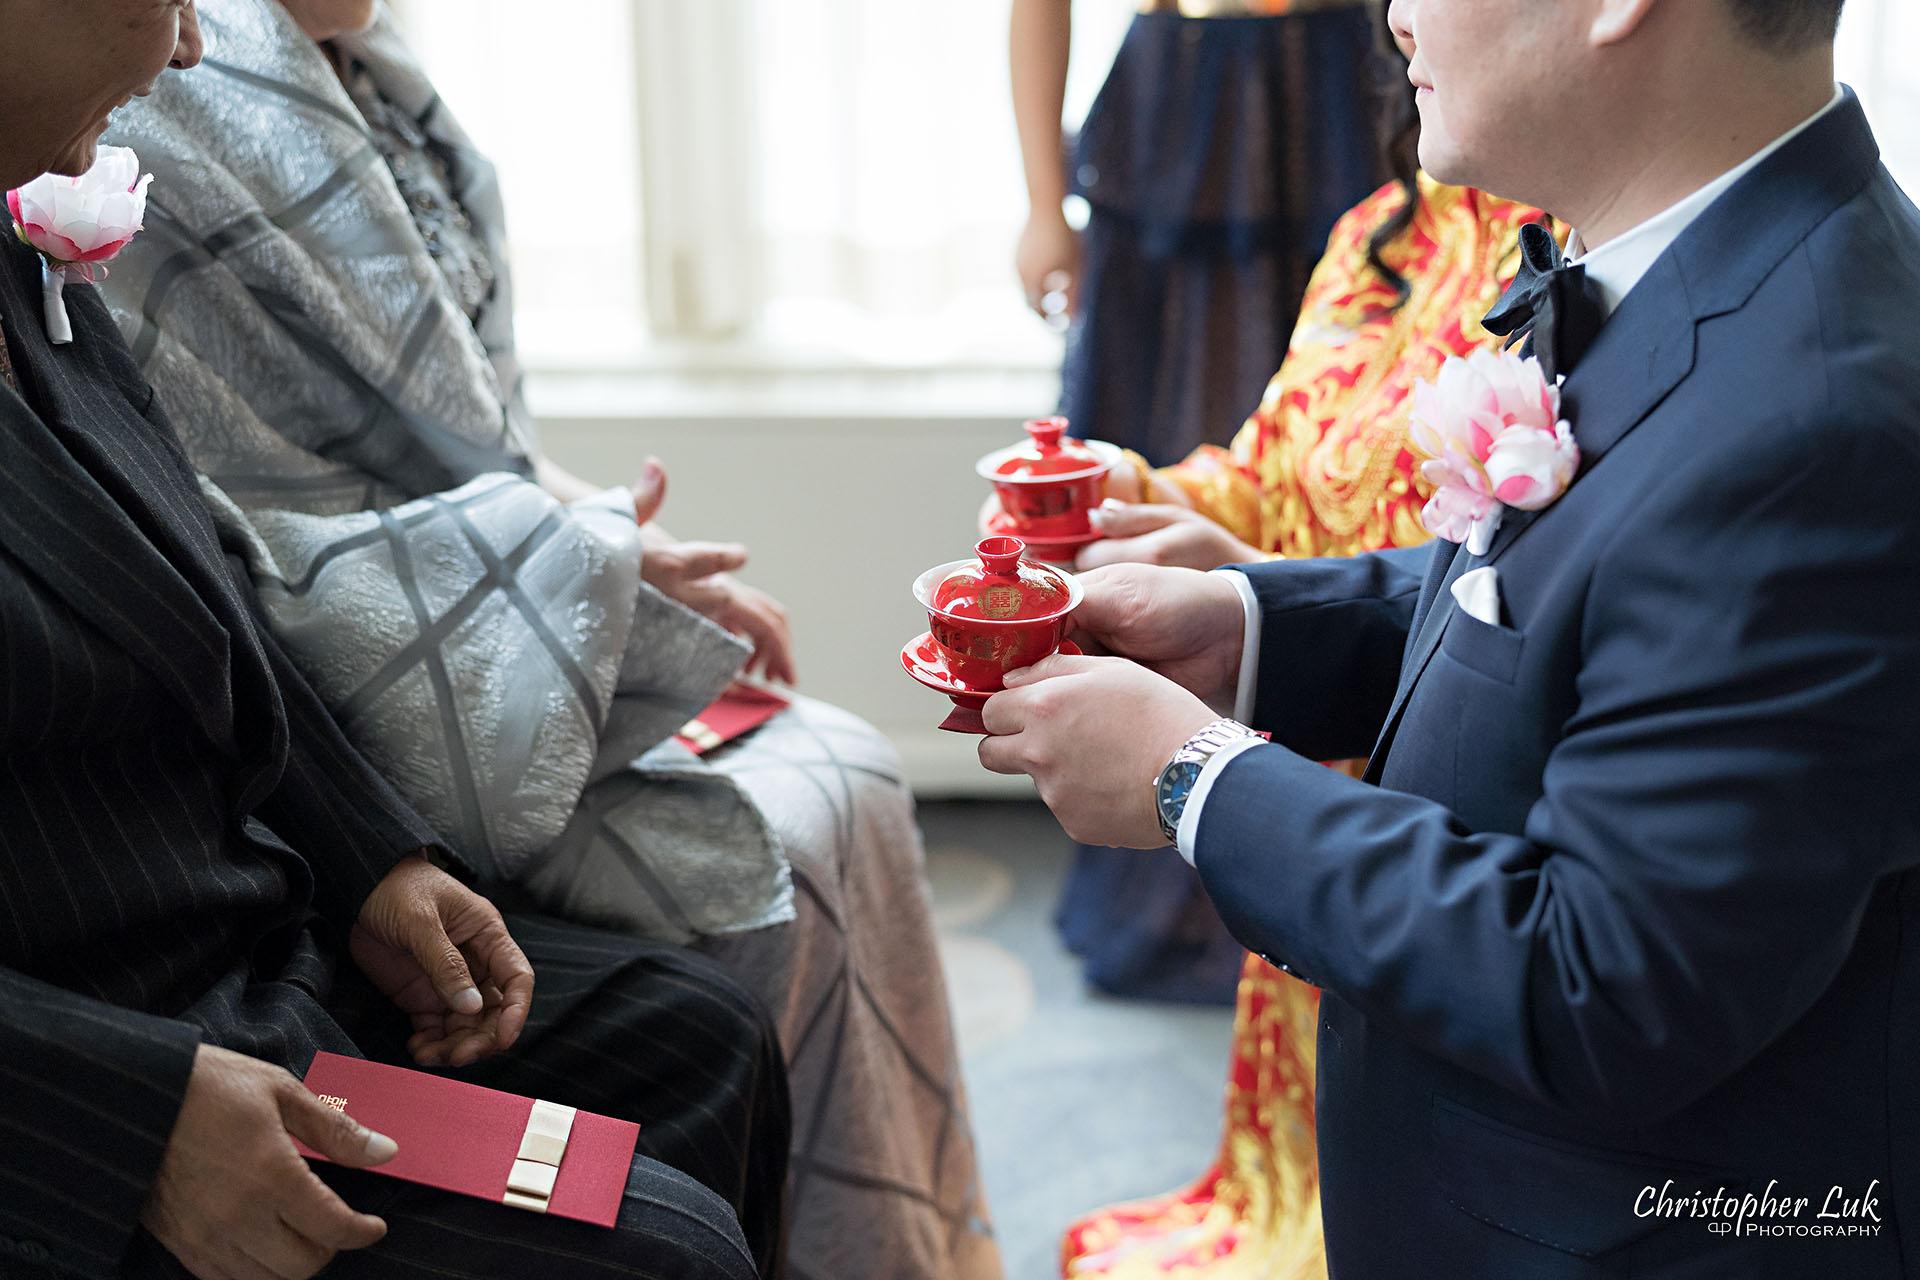 King Edward Hotel Crystal Ballroom Toronto Wedding Photographer MicroWedding Sovereign Ballroom Chinese Tea Ceremony Red Qipao Qun Kwa Cheongsam Traditional Dress Details